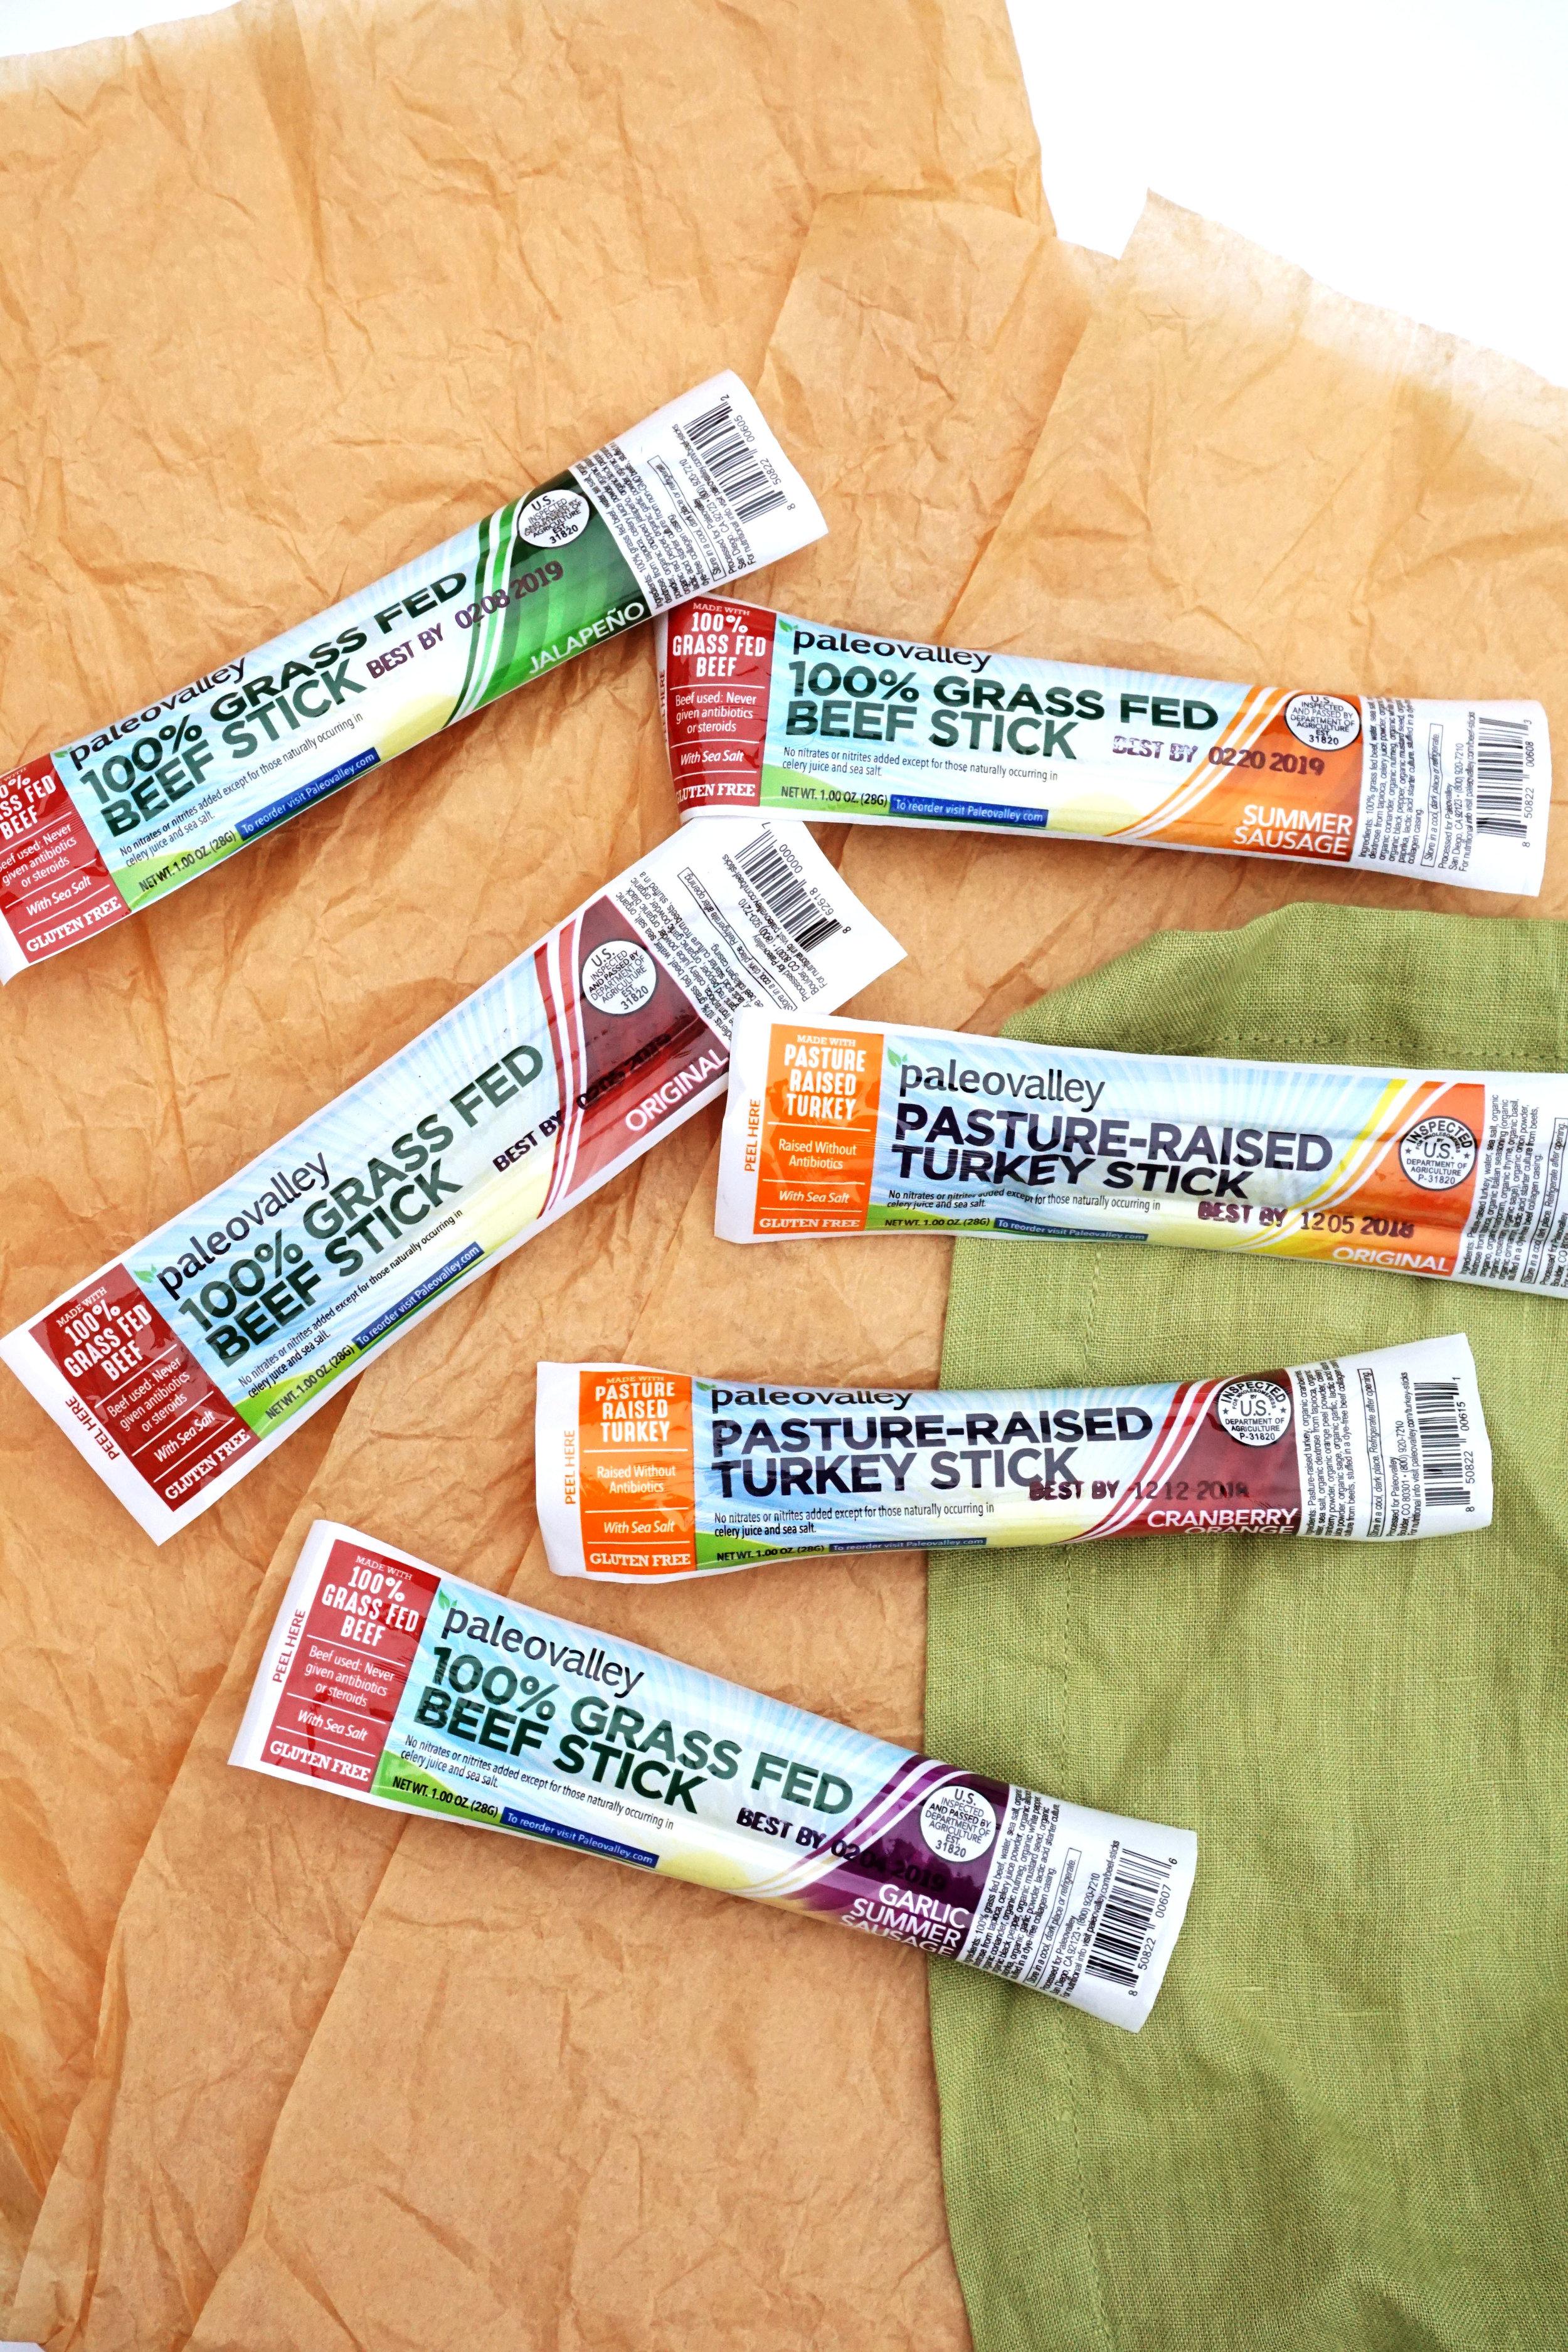 PaleoValley Pasture-Raised Turkey and Grass-Fed Beef Sticks